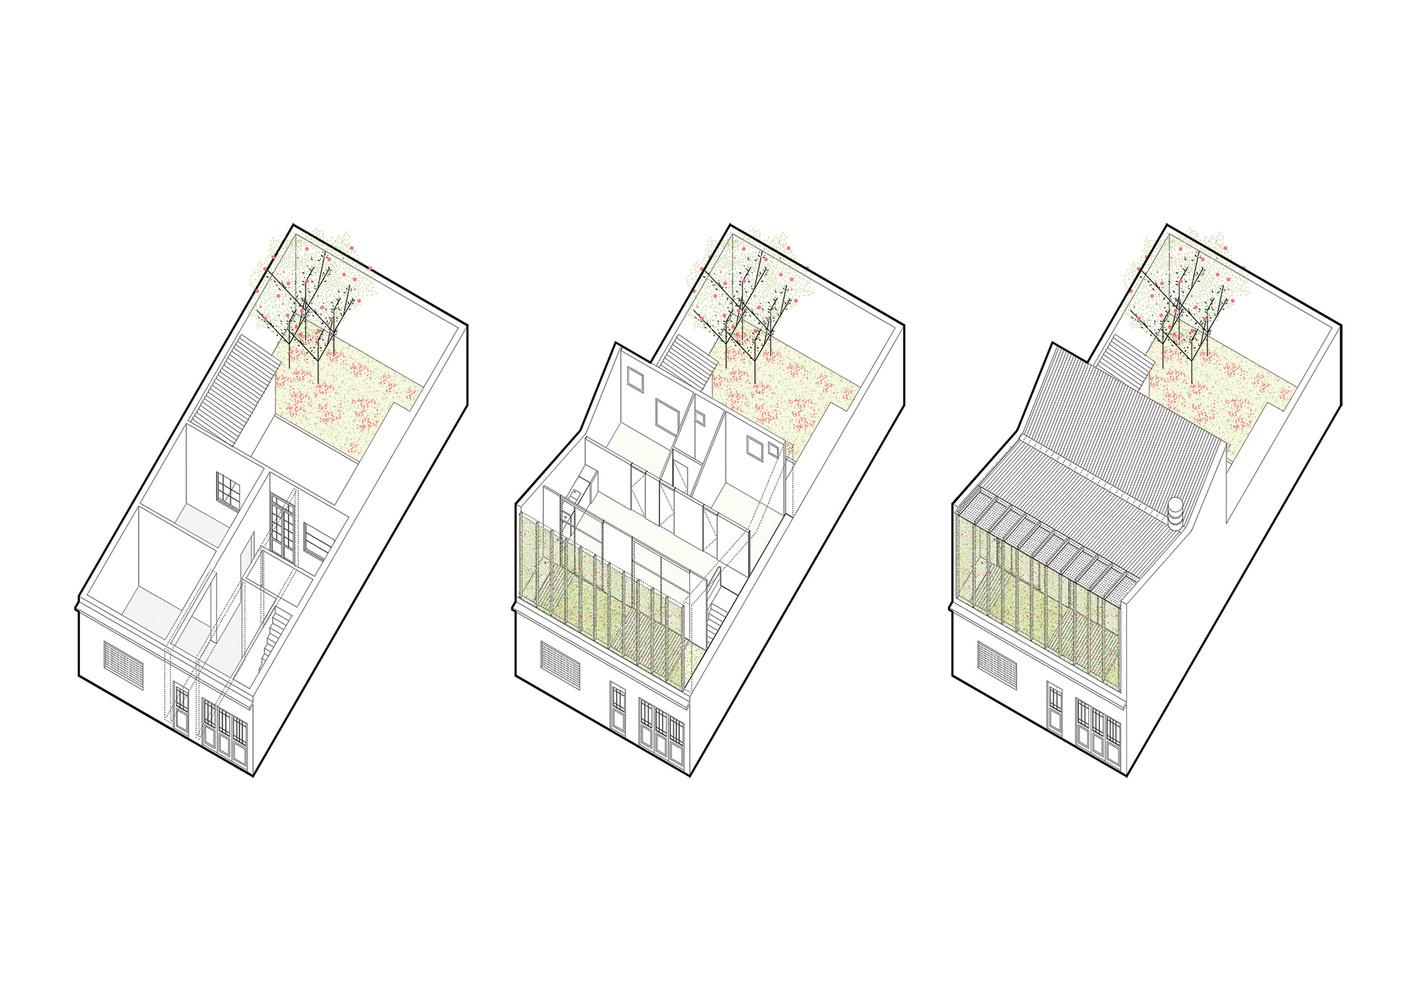 silvina omar house isometric views